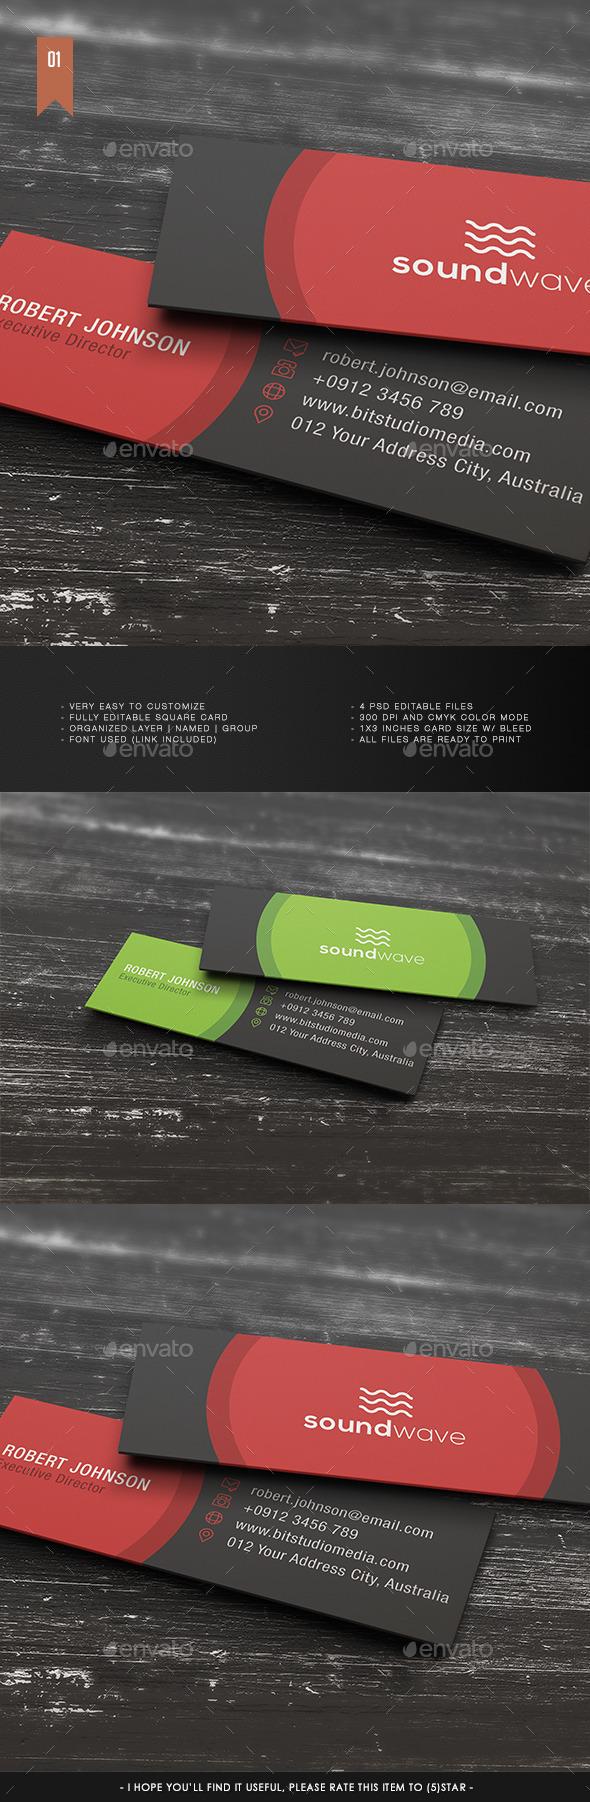 Micro Business Card V.001 by Teestrim | GraphicRiver